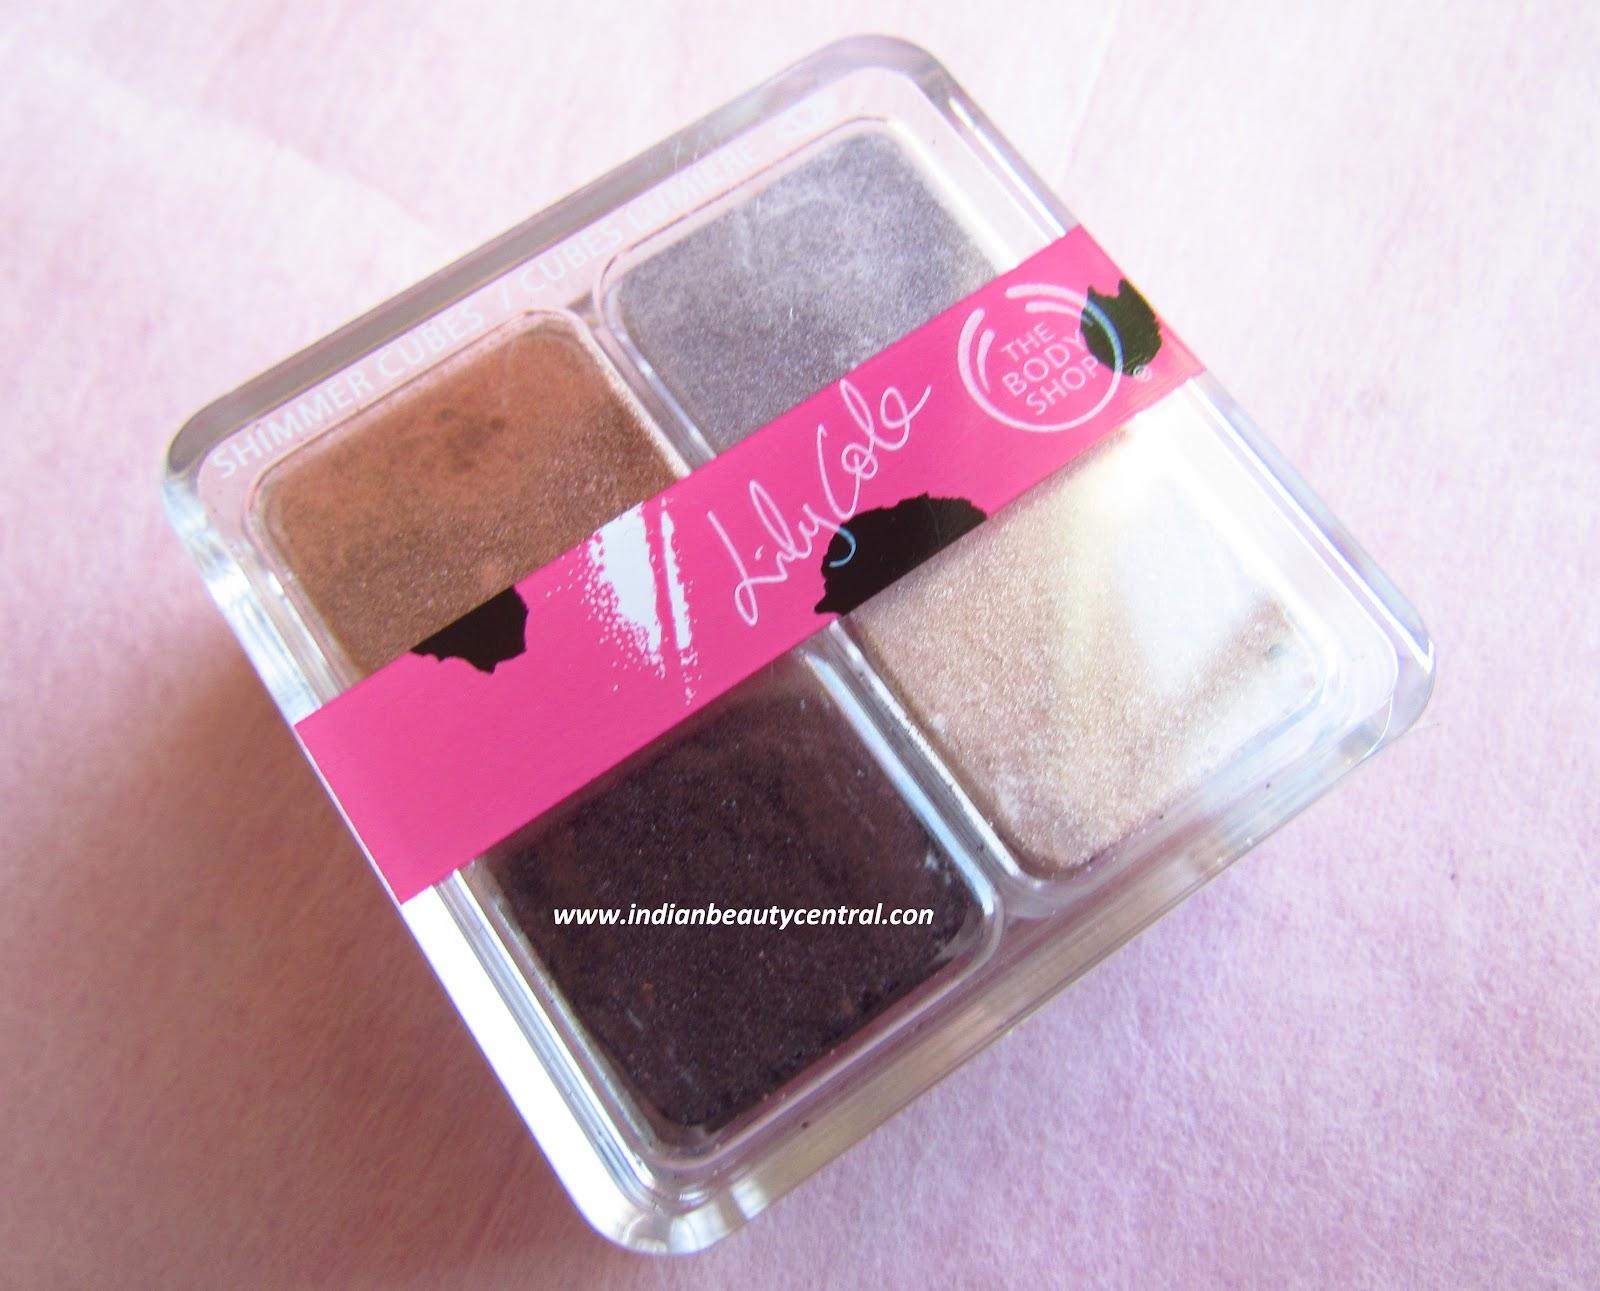 http://4.bp.blogspot.com/-AkAY0l3J4r0/UE91zsVjjOI/AAAAAAAAJQg/rXzK8xMwM8E/s1600/The+Boy+Shop+Lily+Cole+Giveaway+7.jpg